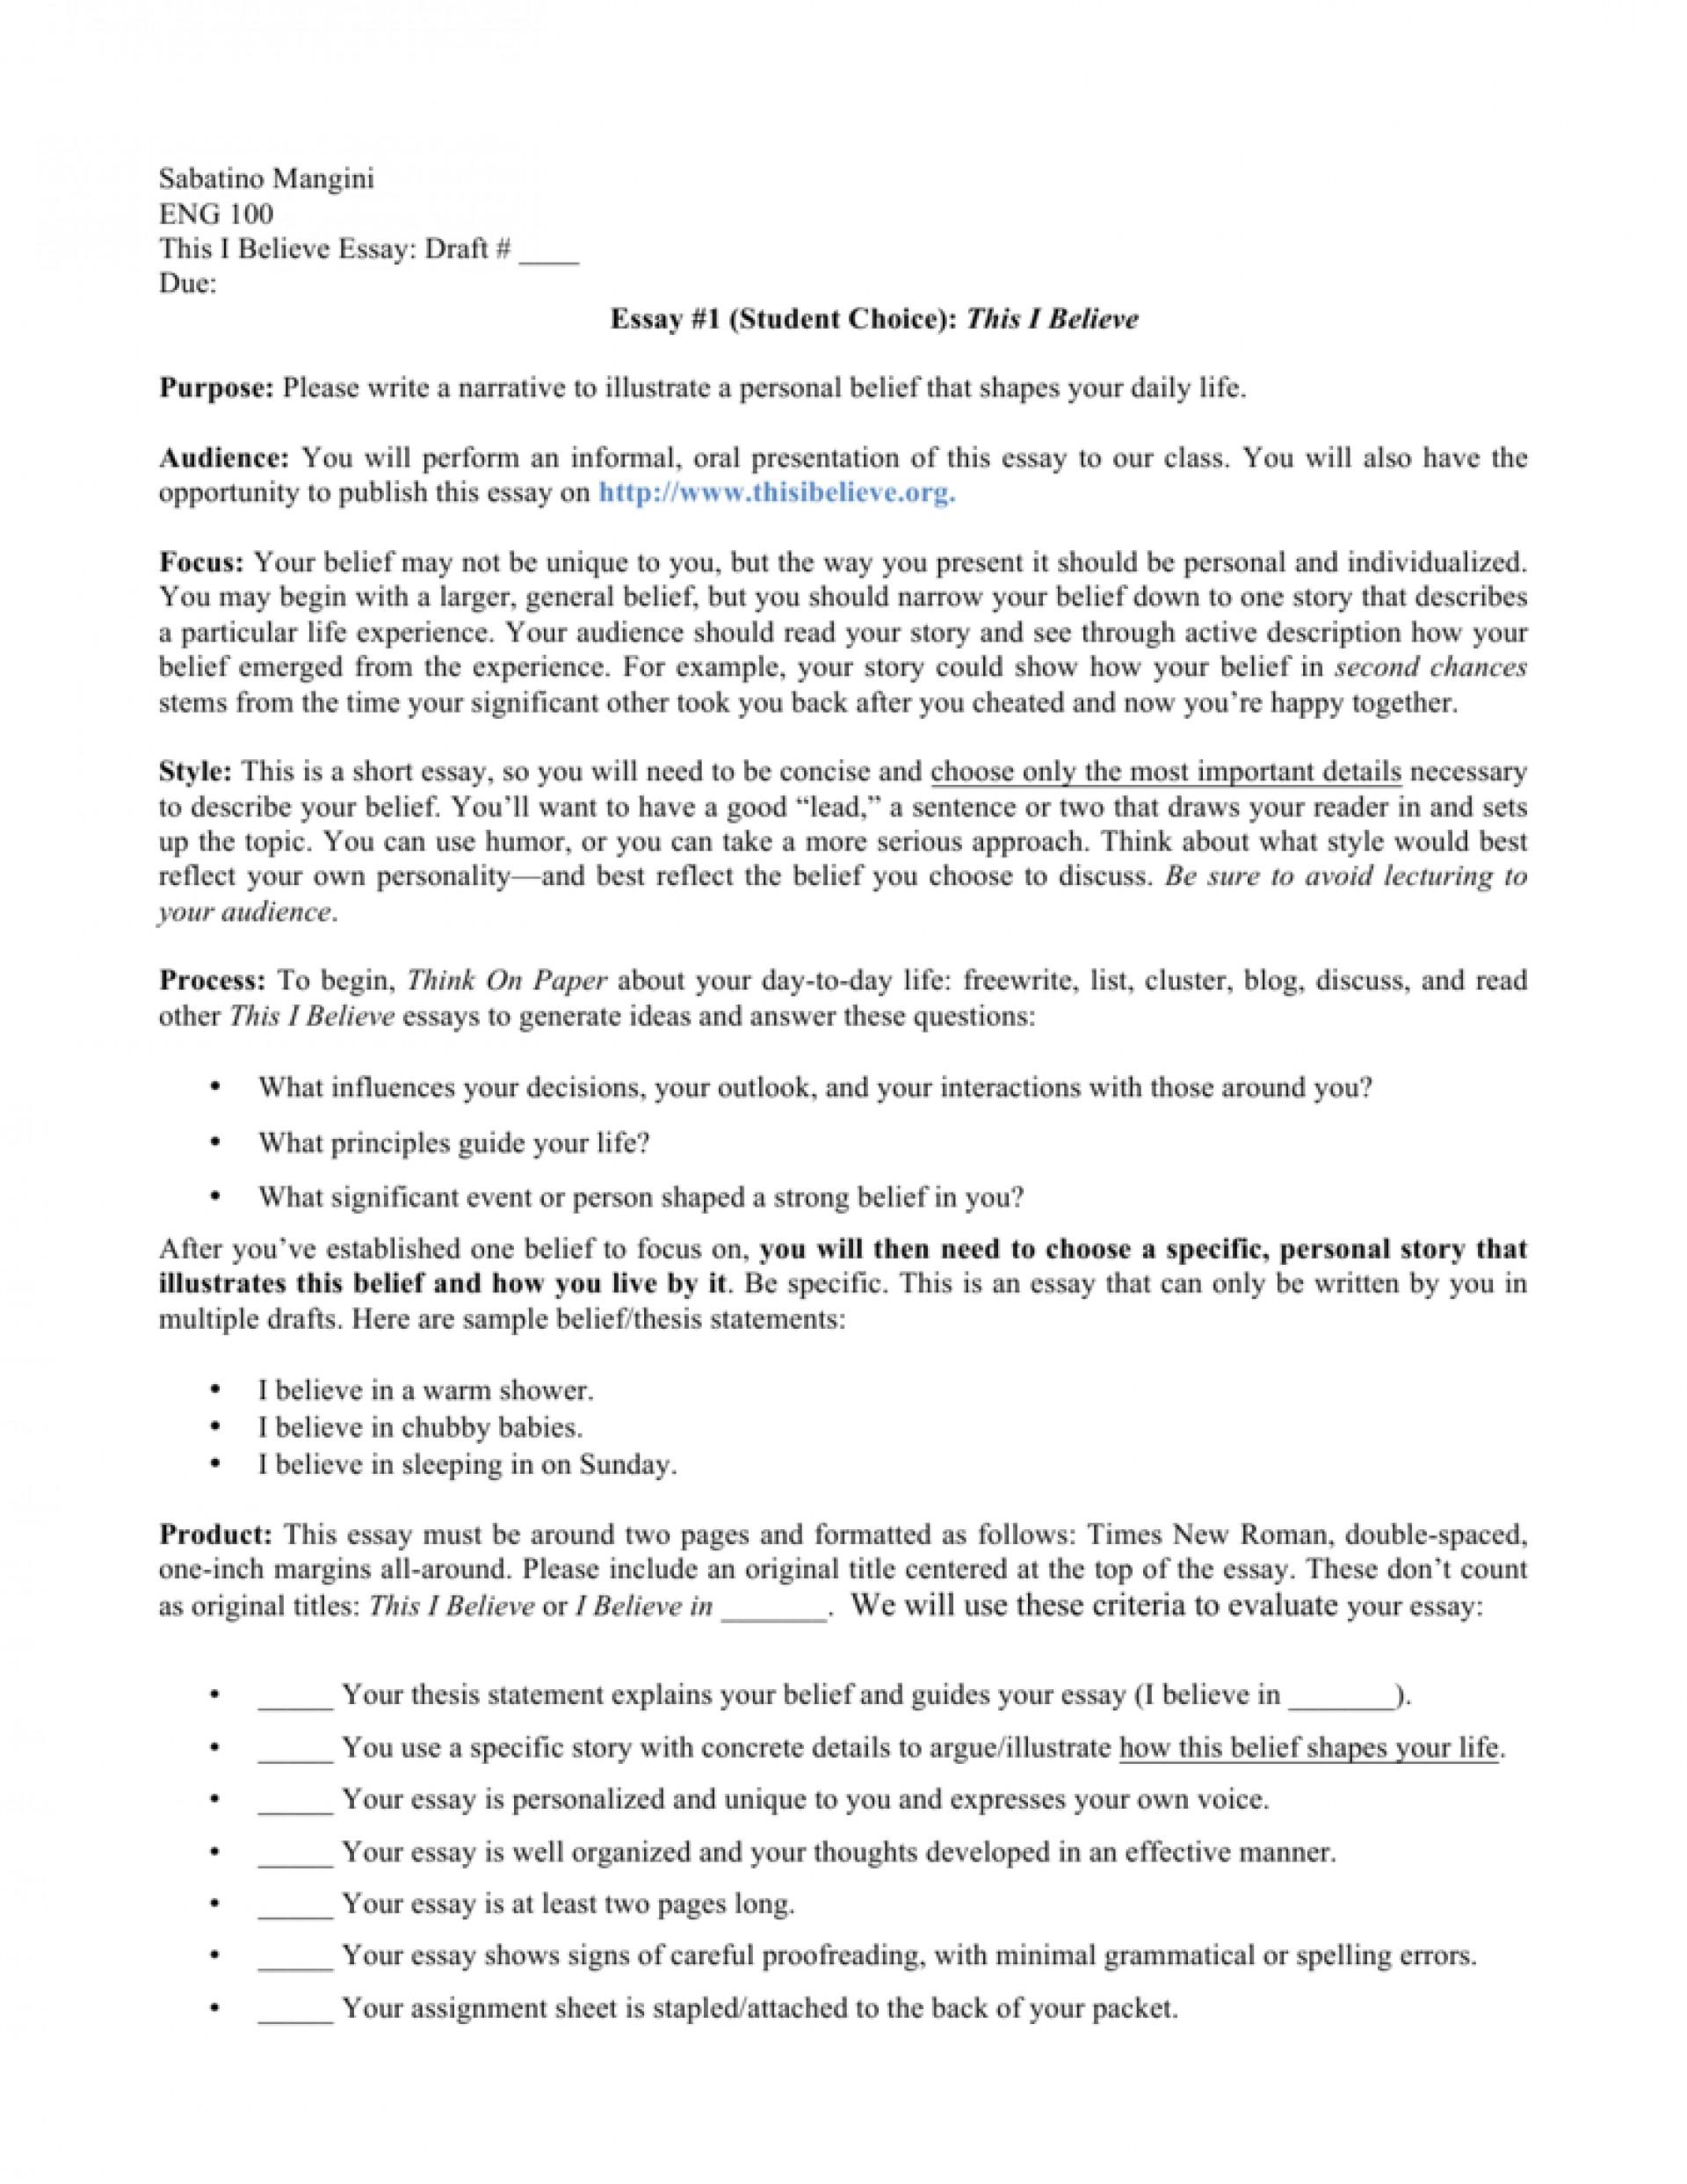 004 I Believe Essay 008807227 1 Impressive This Examples College Rubric Format 1920